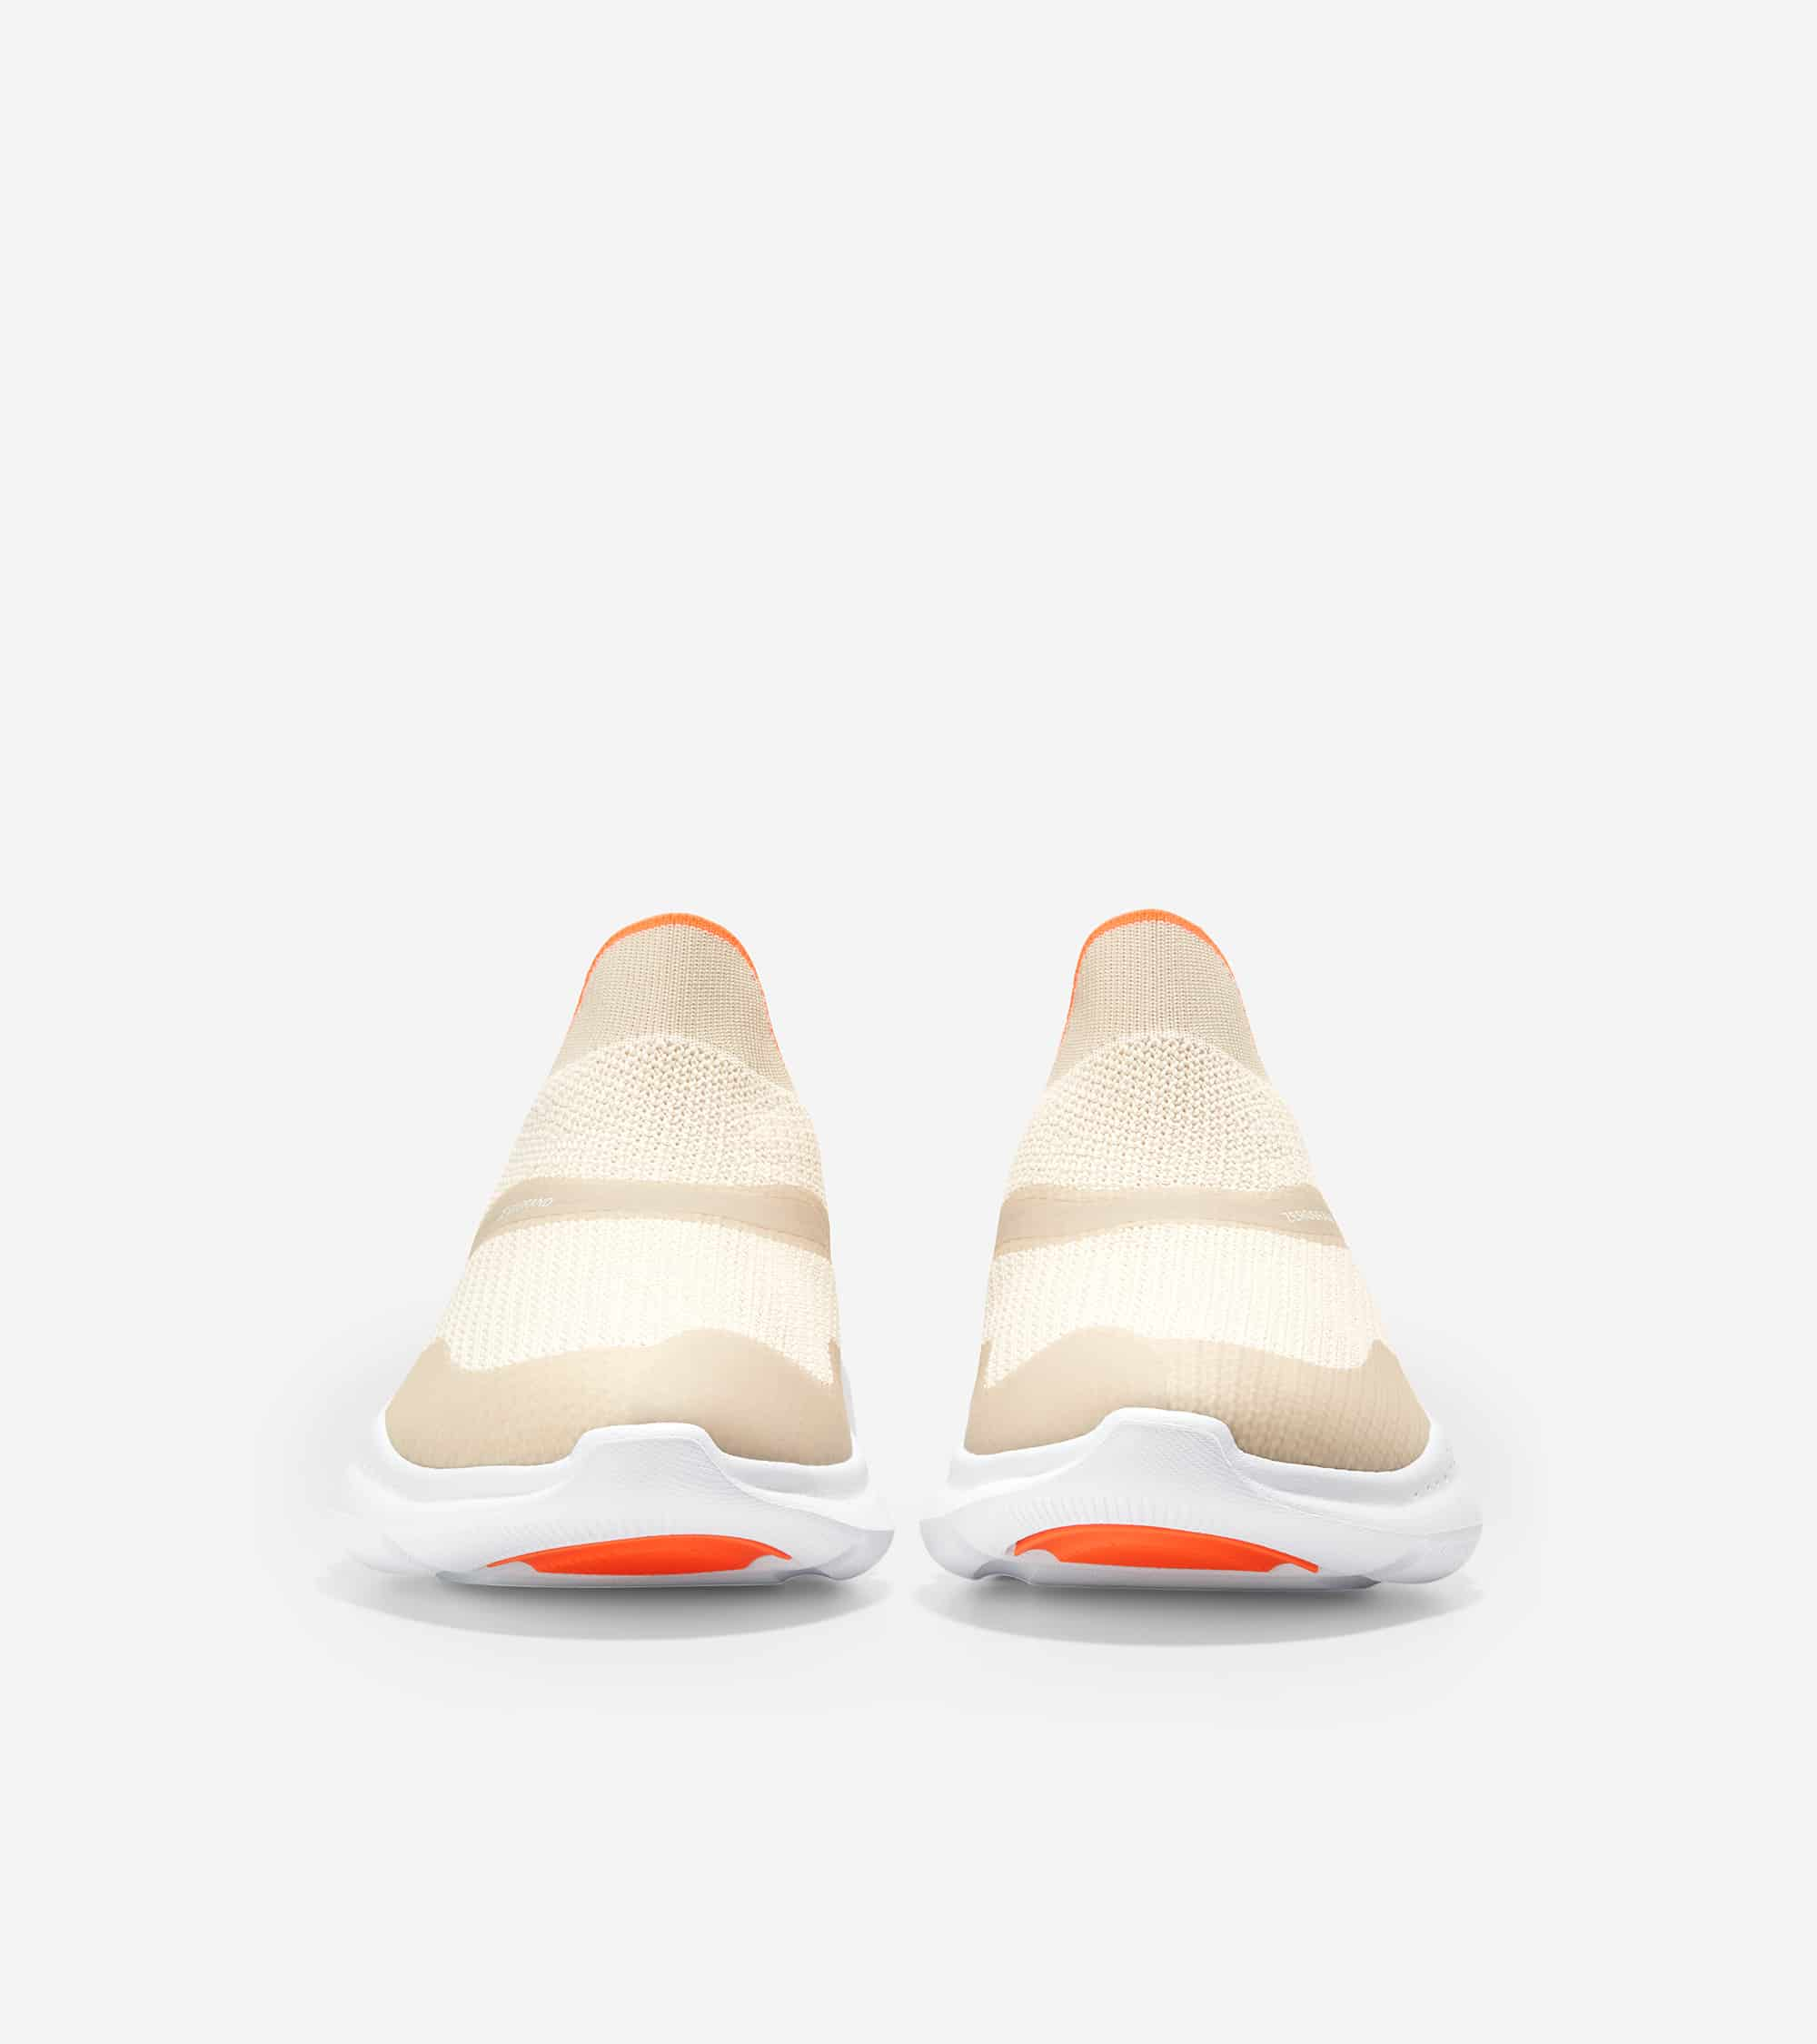 Cole Haan ZERØGRAND Radiant Slip On Sneaker Cement Tpu/ Cement & Opt White Knit/ Shocking Orange/ Optic White